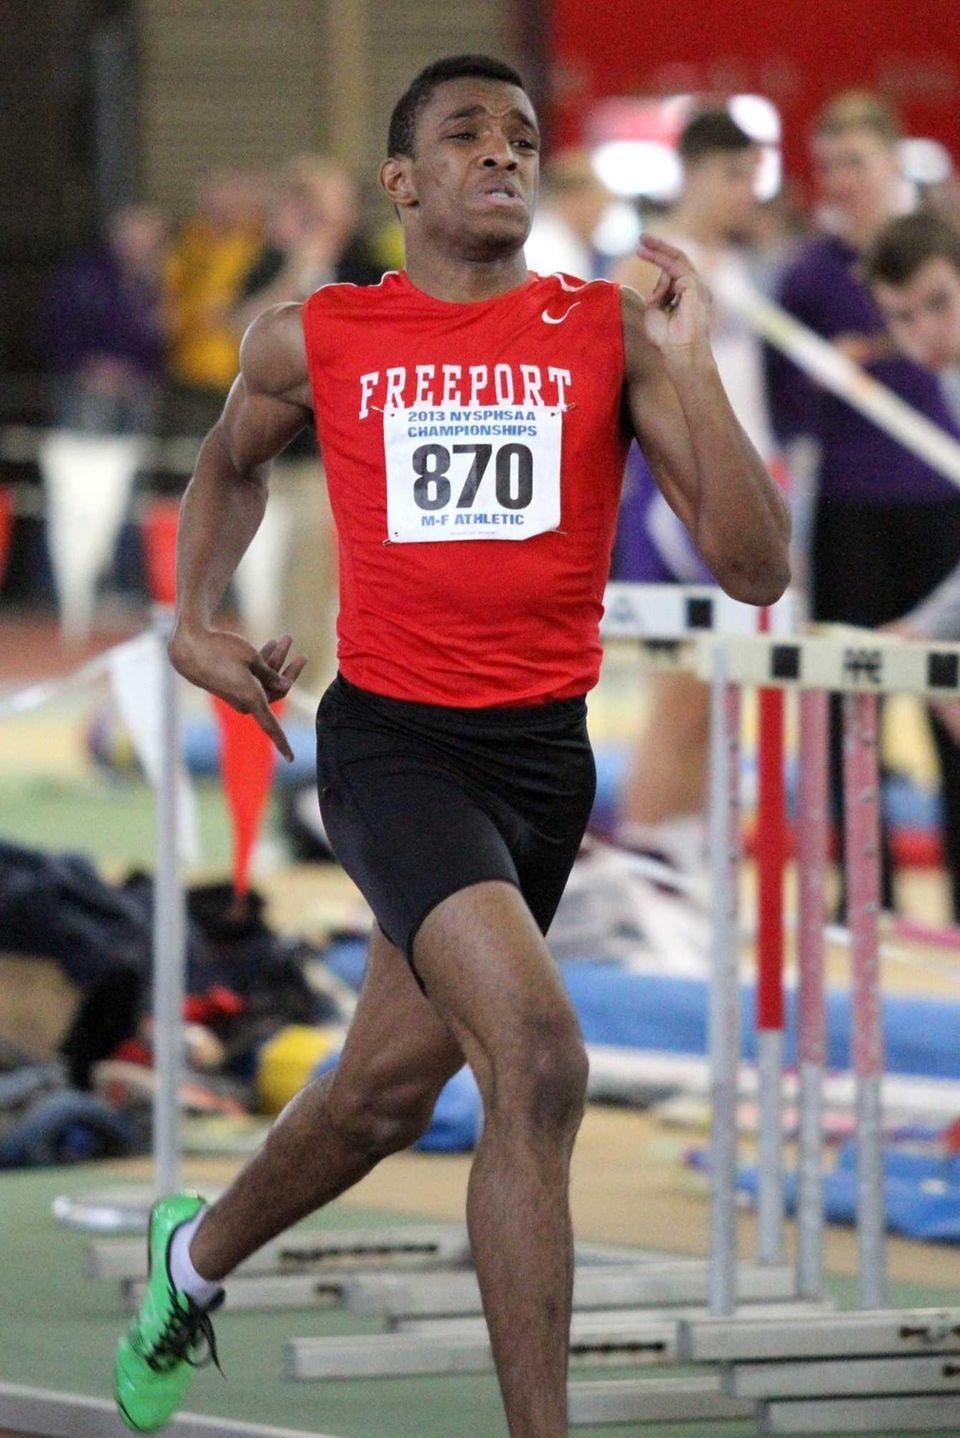 Freeport's Jonathan Greenwood looks to the finish line